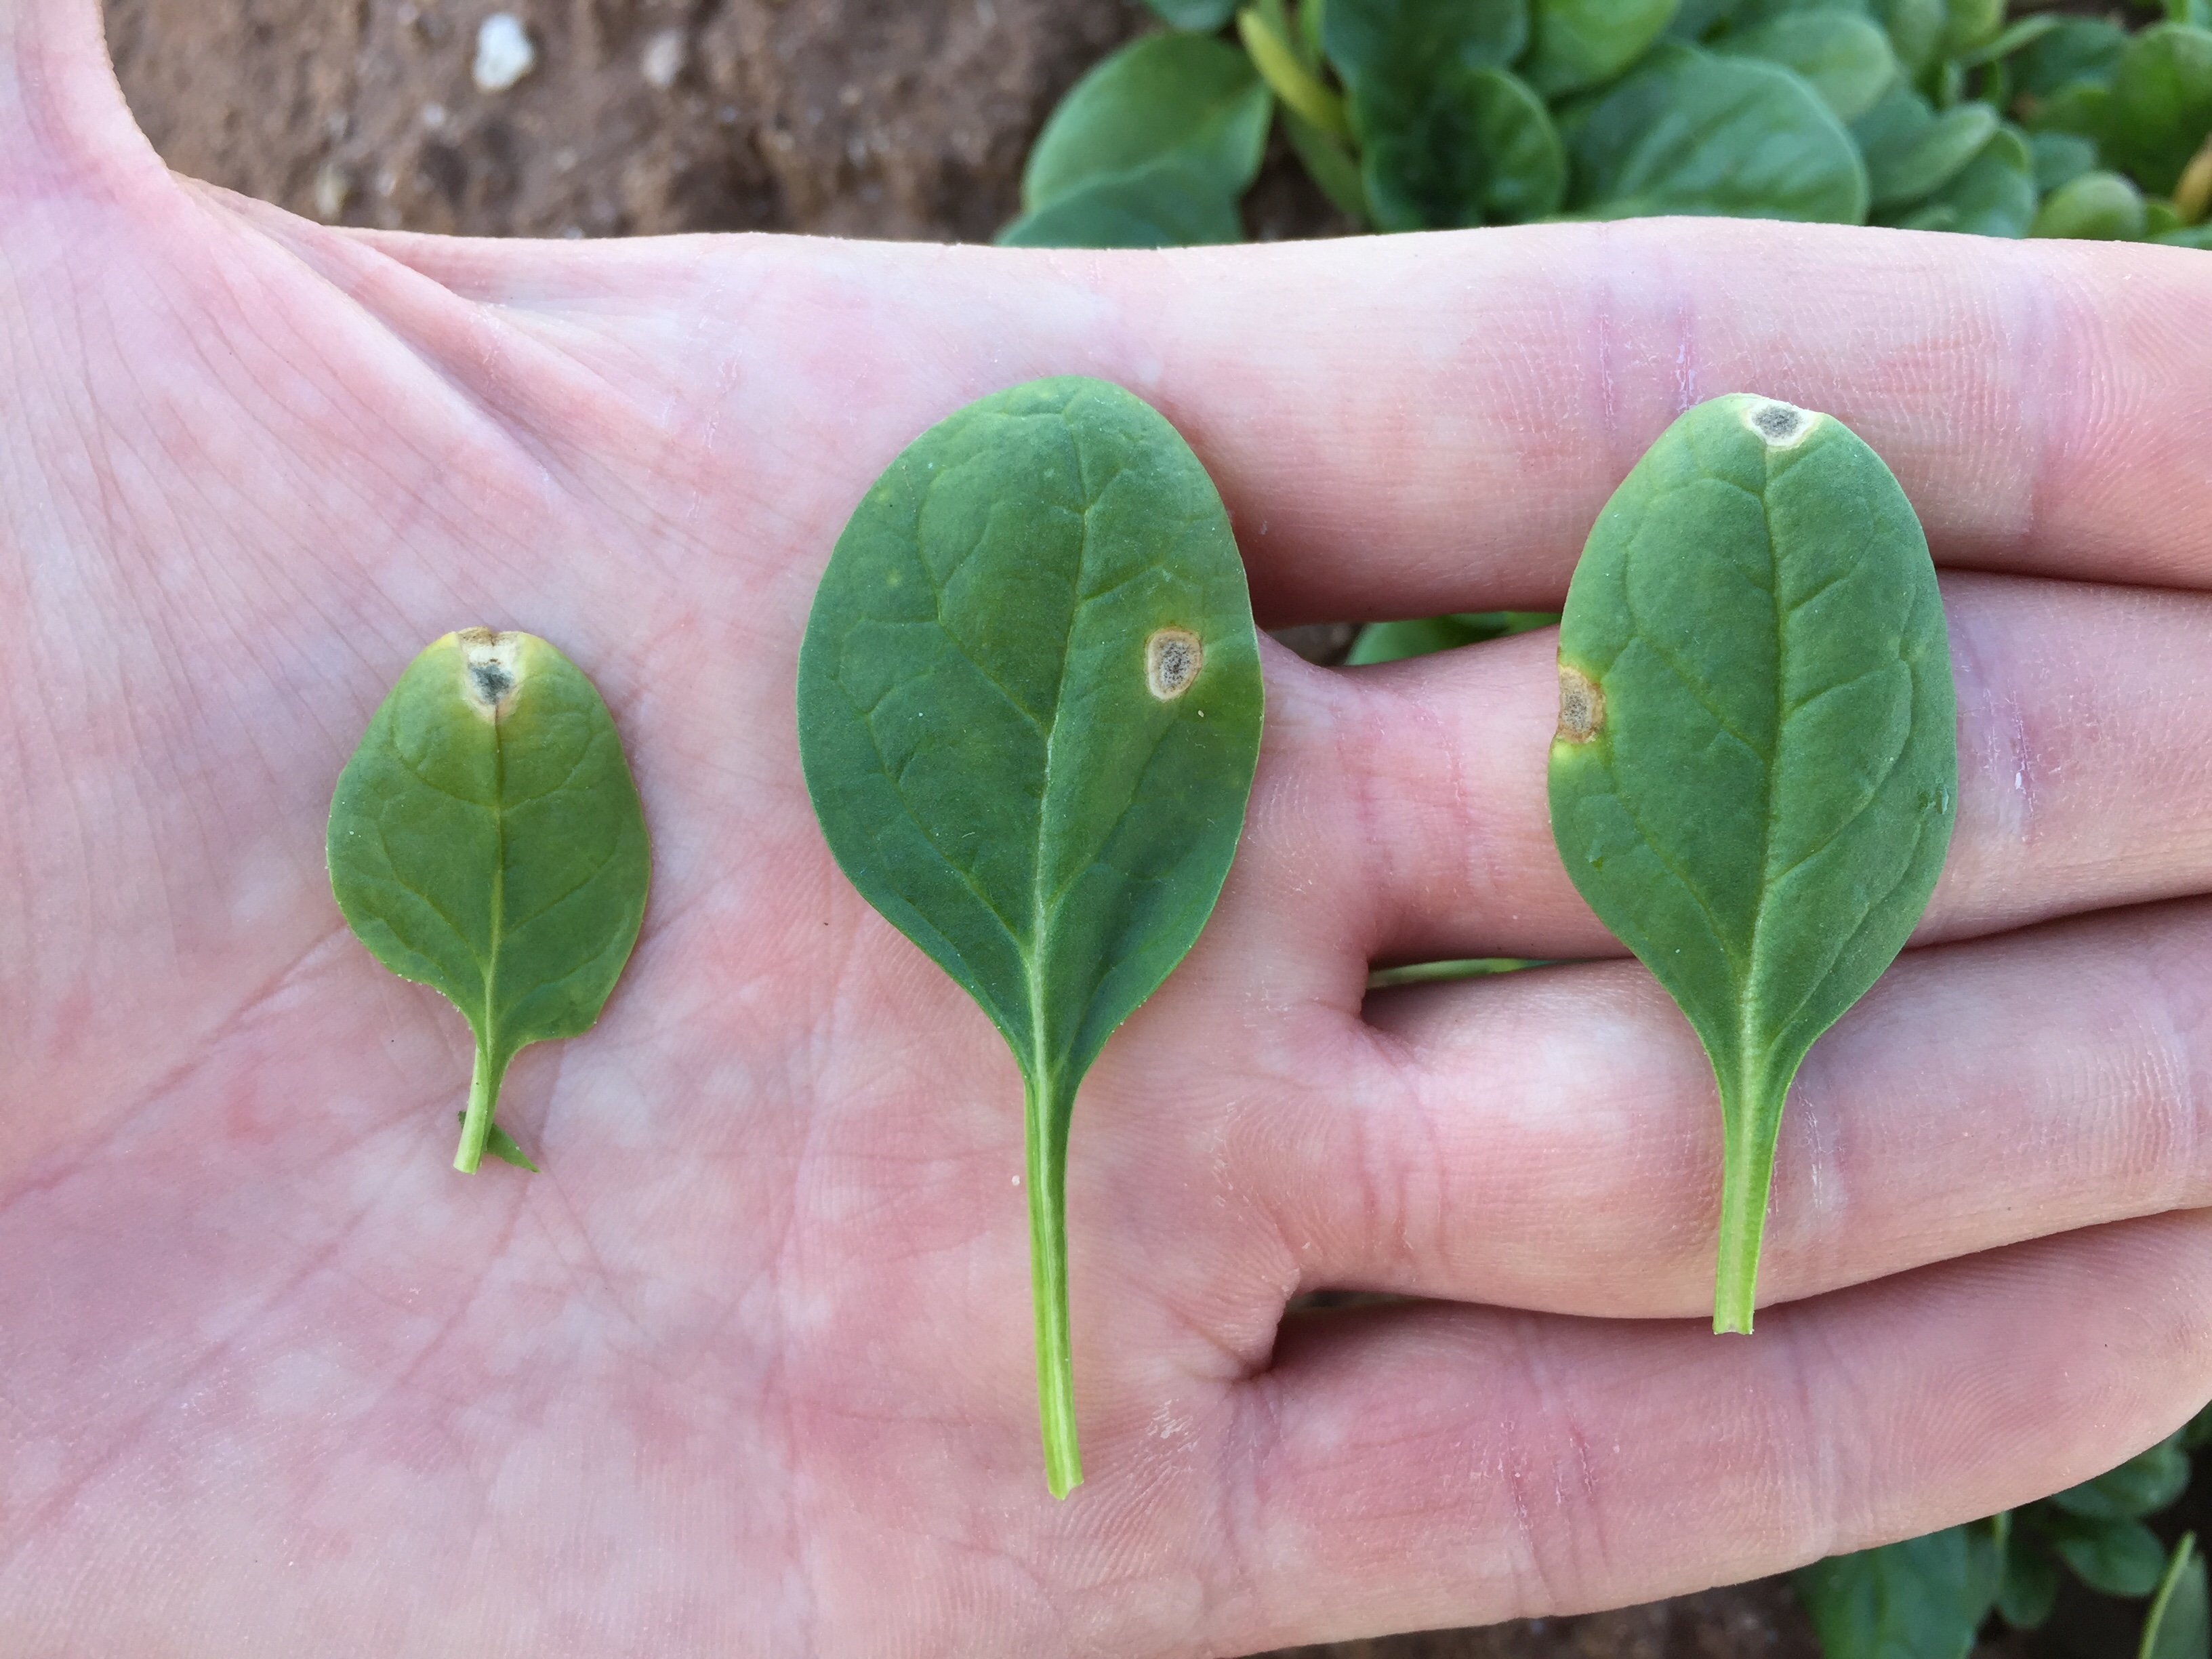 Leaf comparison photo